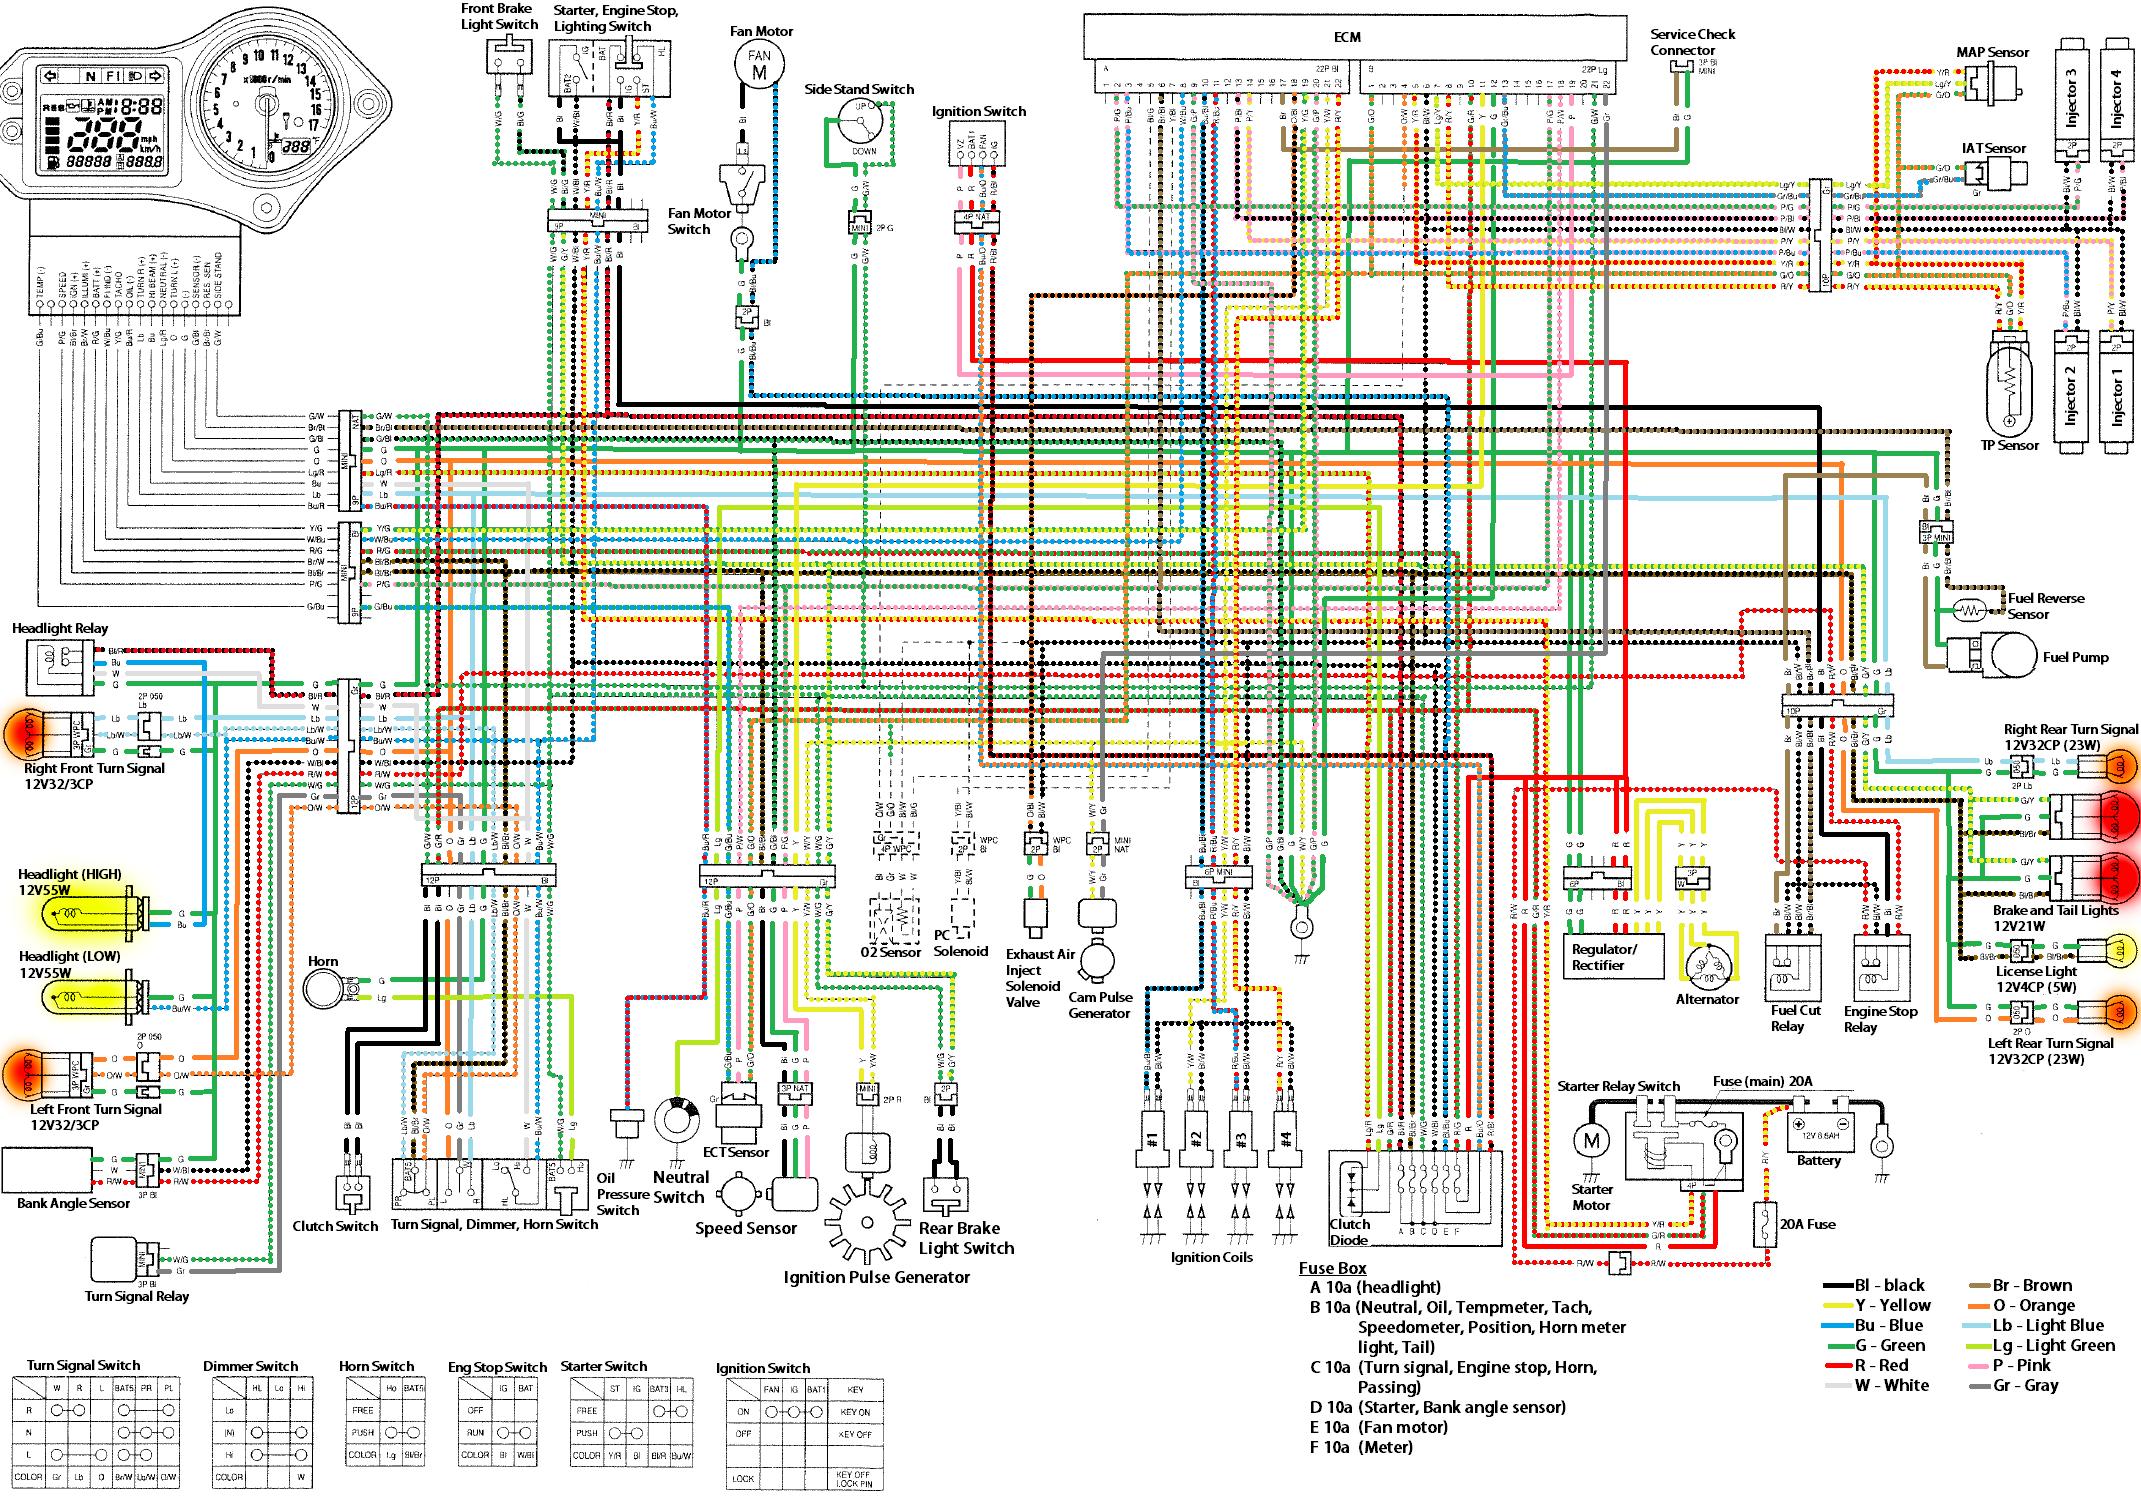 Cbr600rr Wiring Diagram Bargman 7 Way Trailer Wiring Diagram Keys Can Acces Tukune Jeanjaures37 Fr